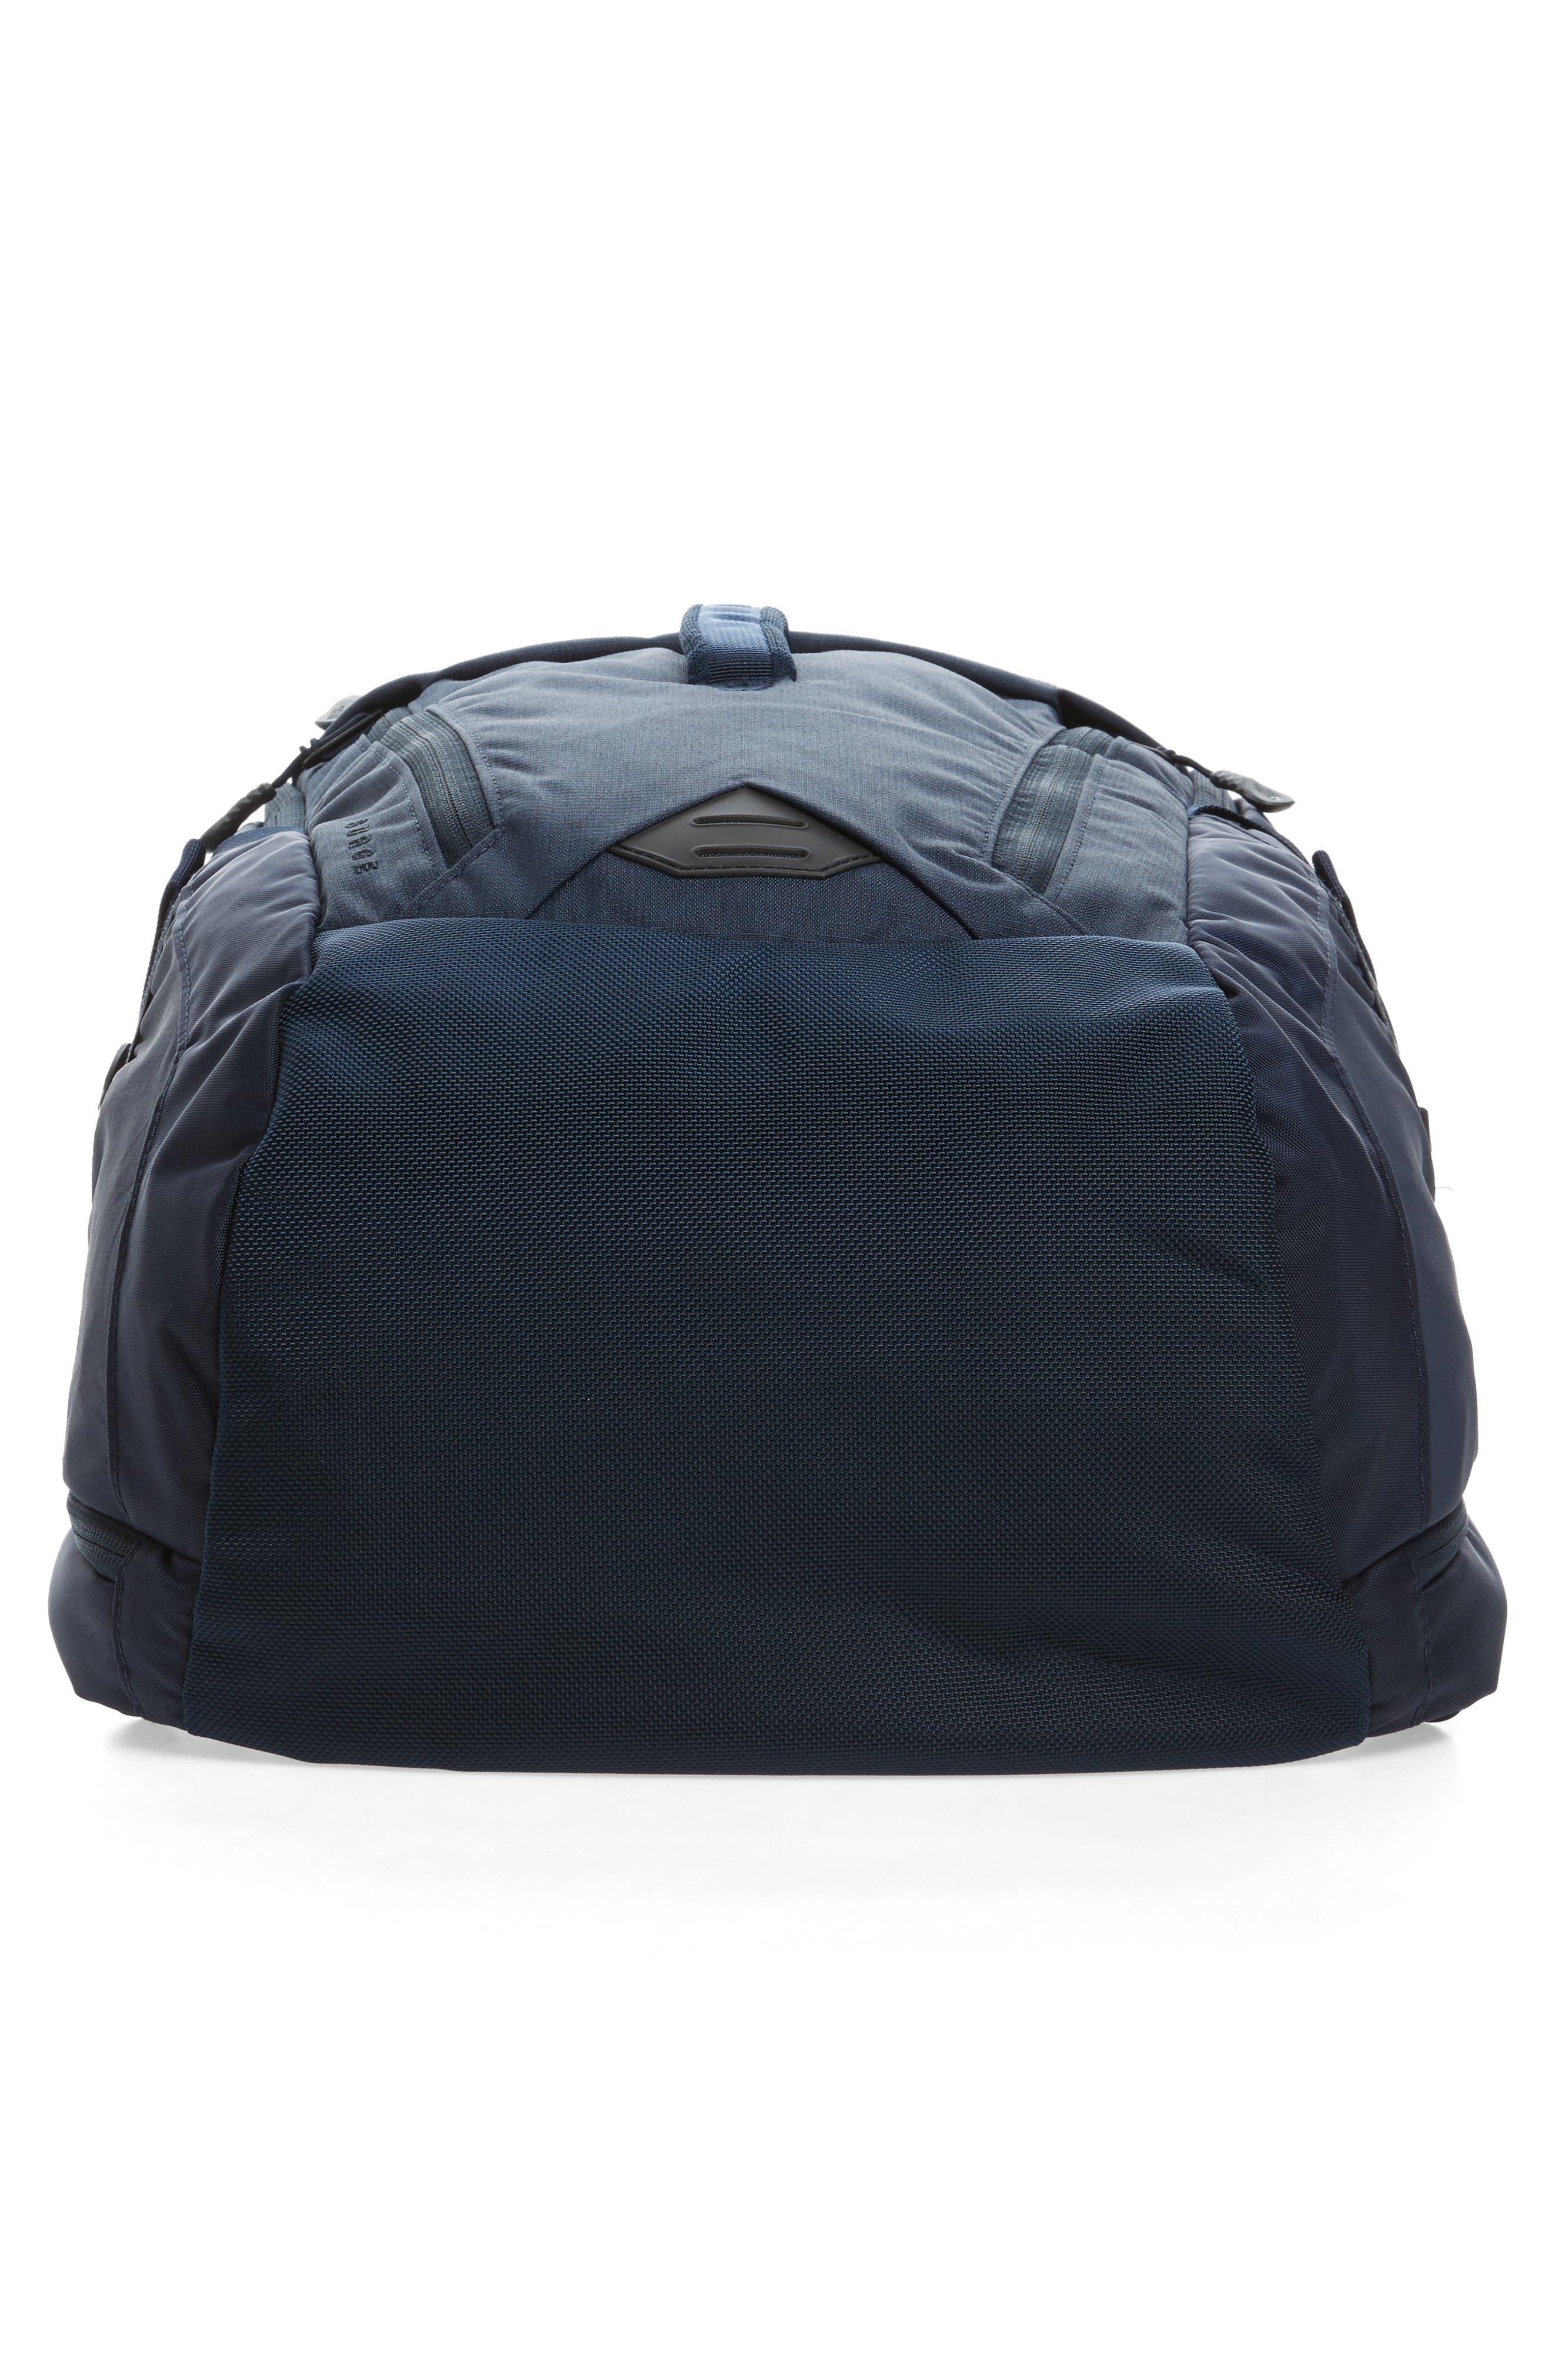 Surge 33L Backpack,                             Alternate thumbnail 21, color,